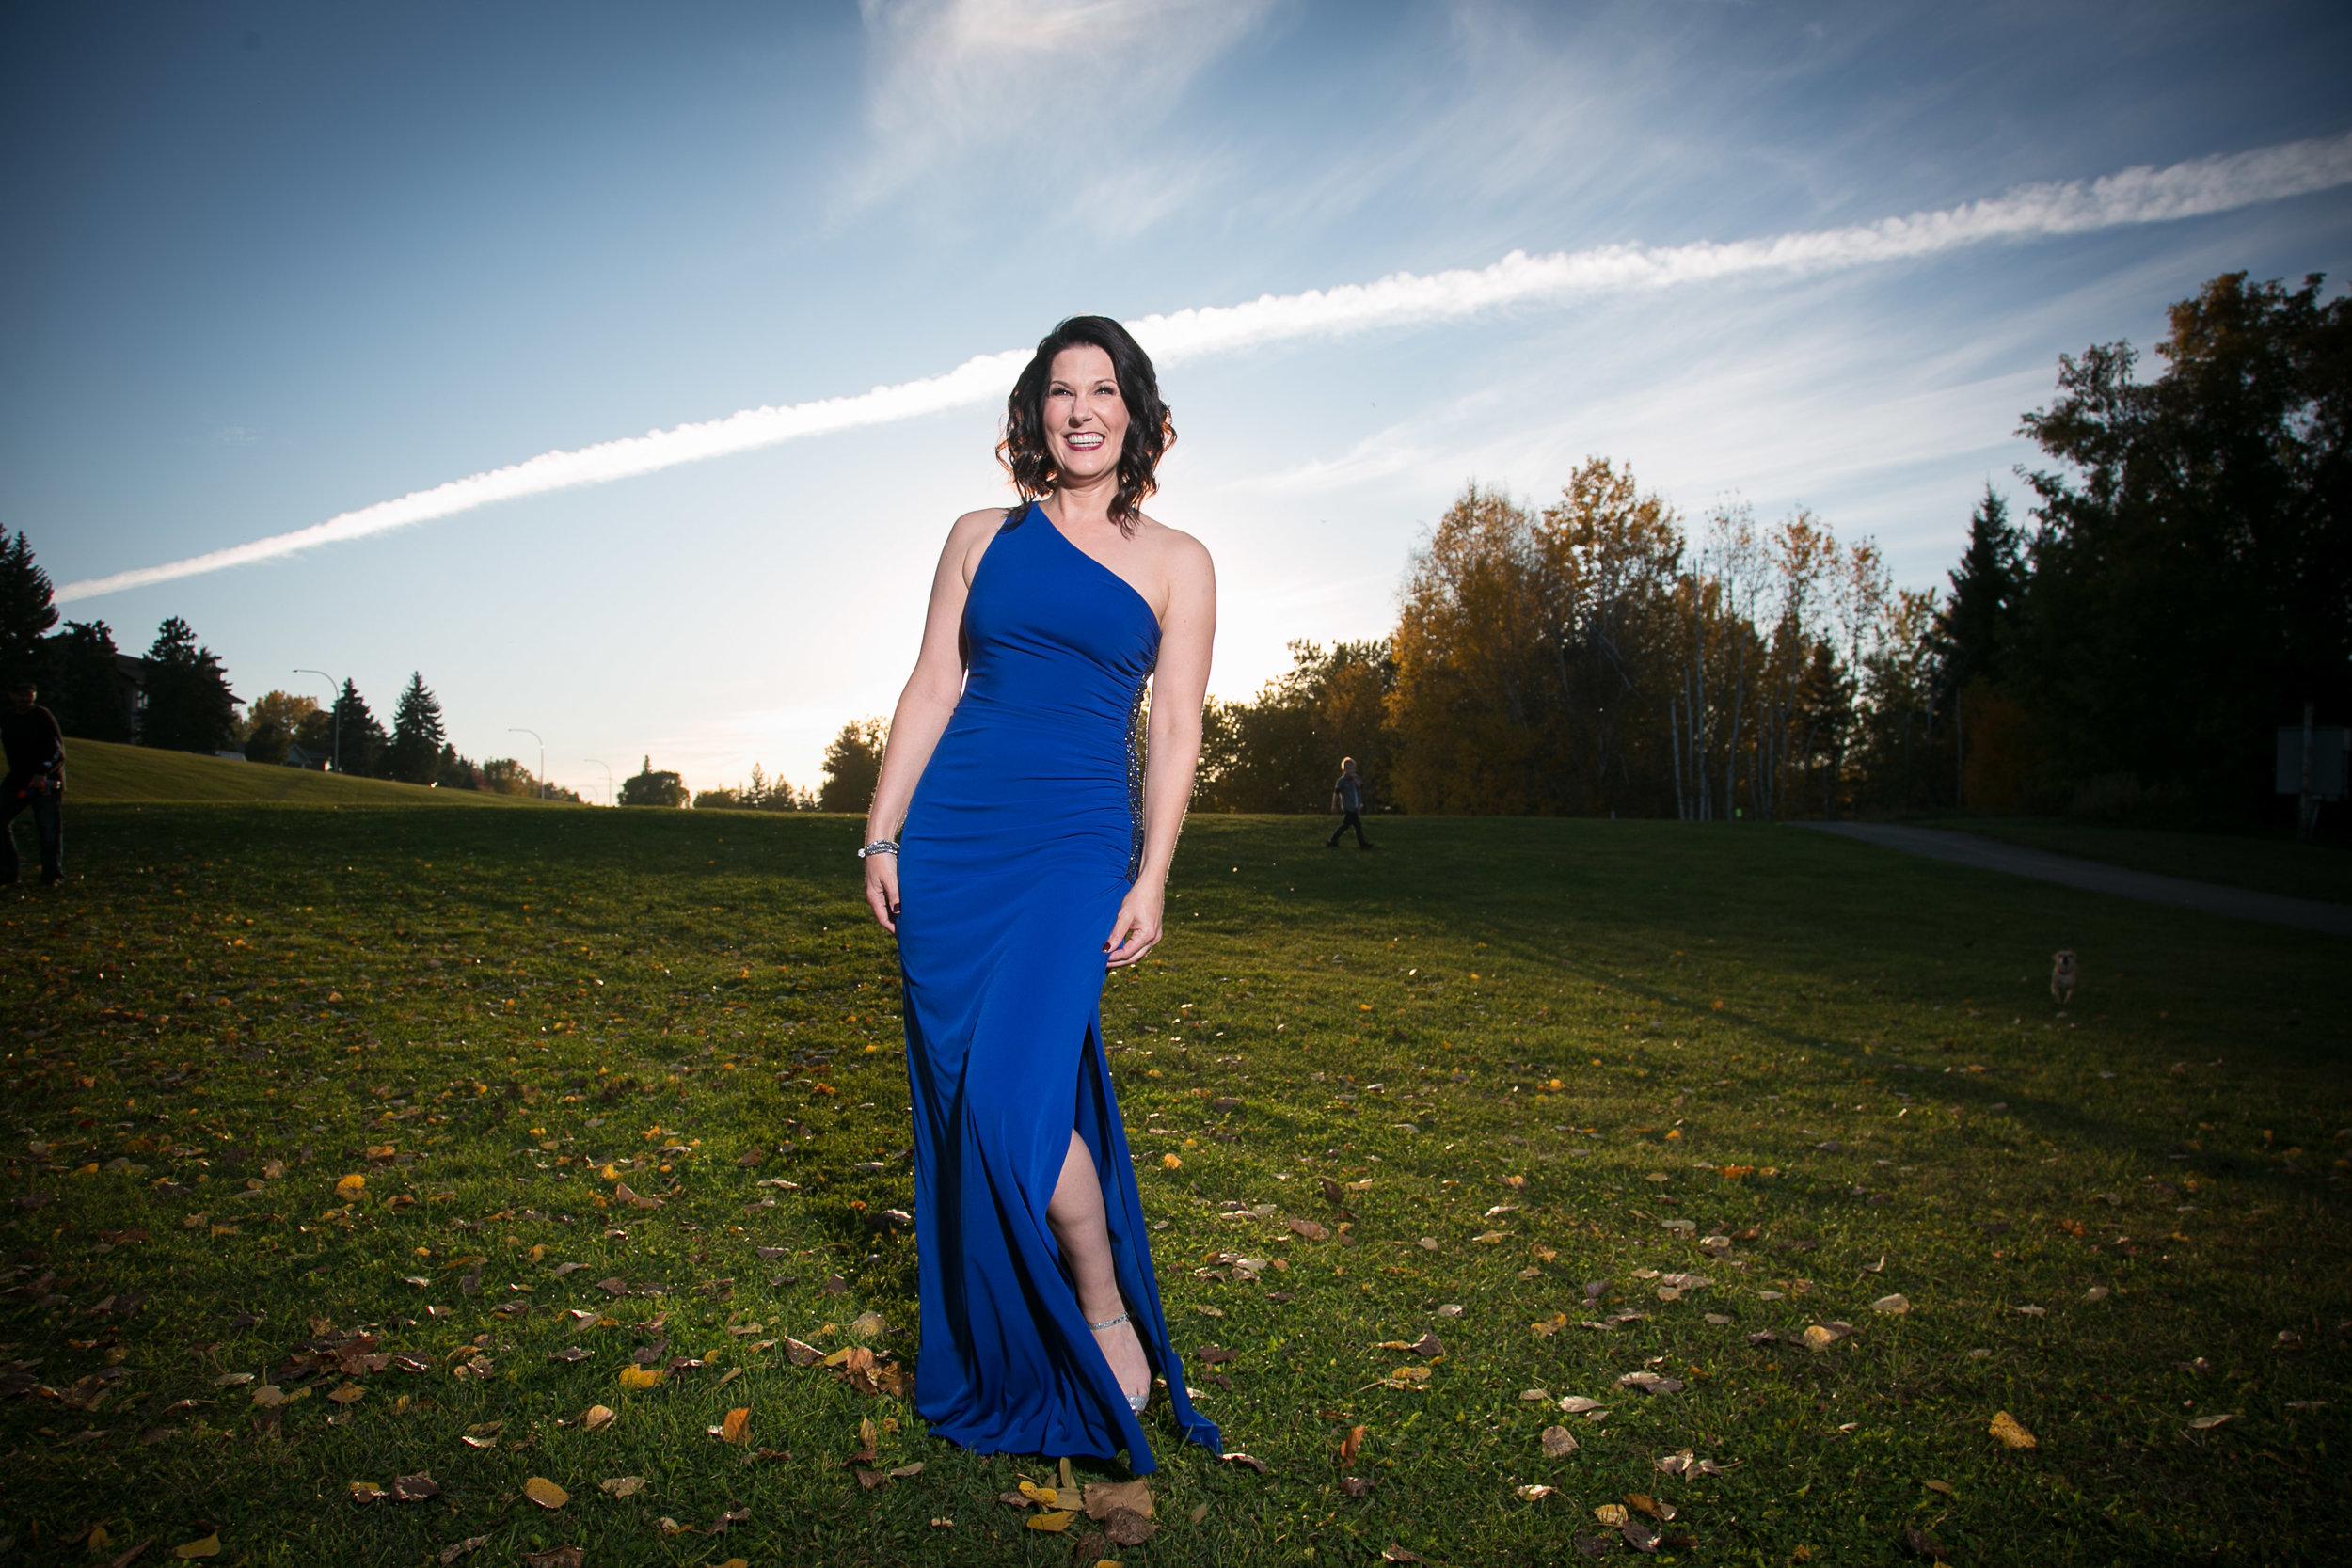 Kelly Rosborough, Bokehccino Project